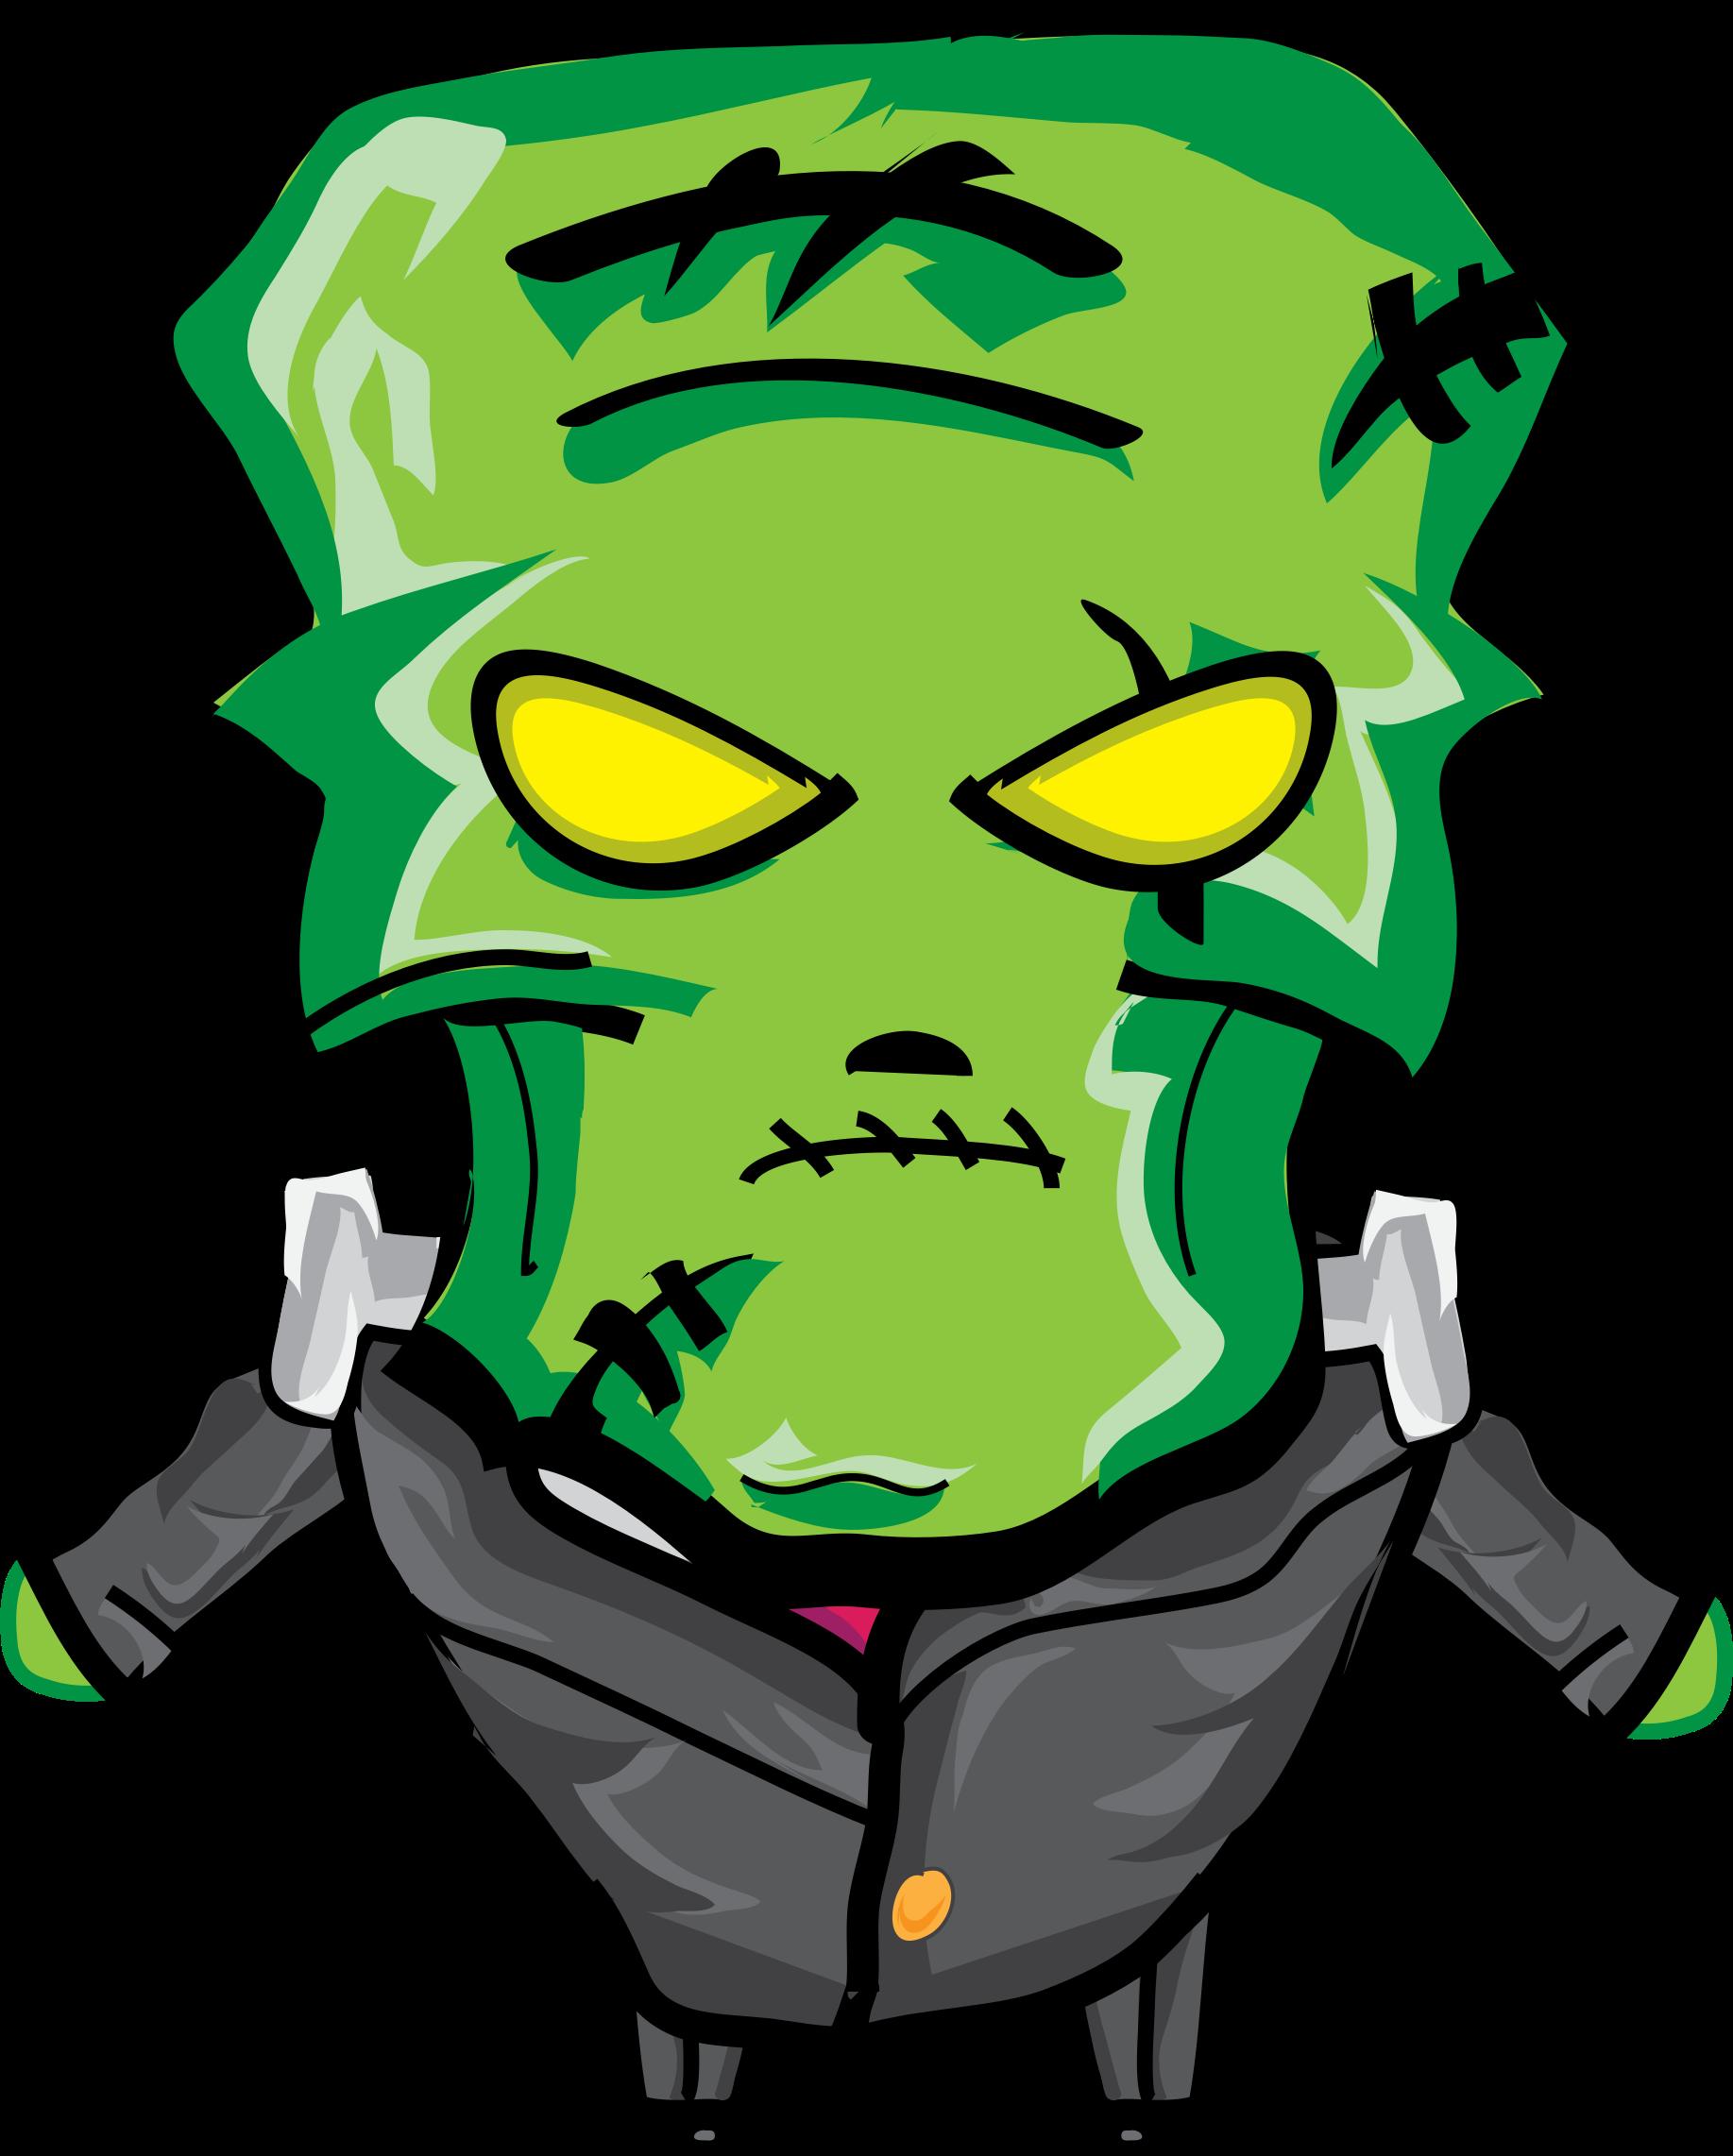 Frankenstein clipart cartoon frankenstein. Big image png